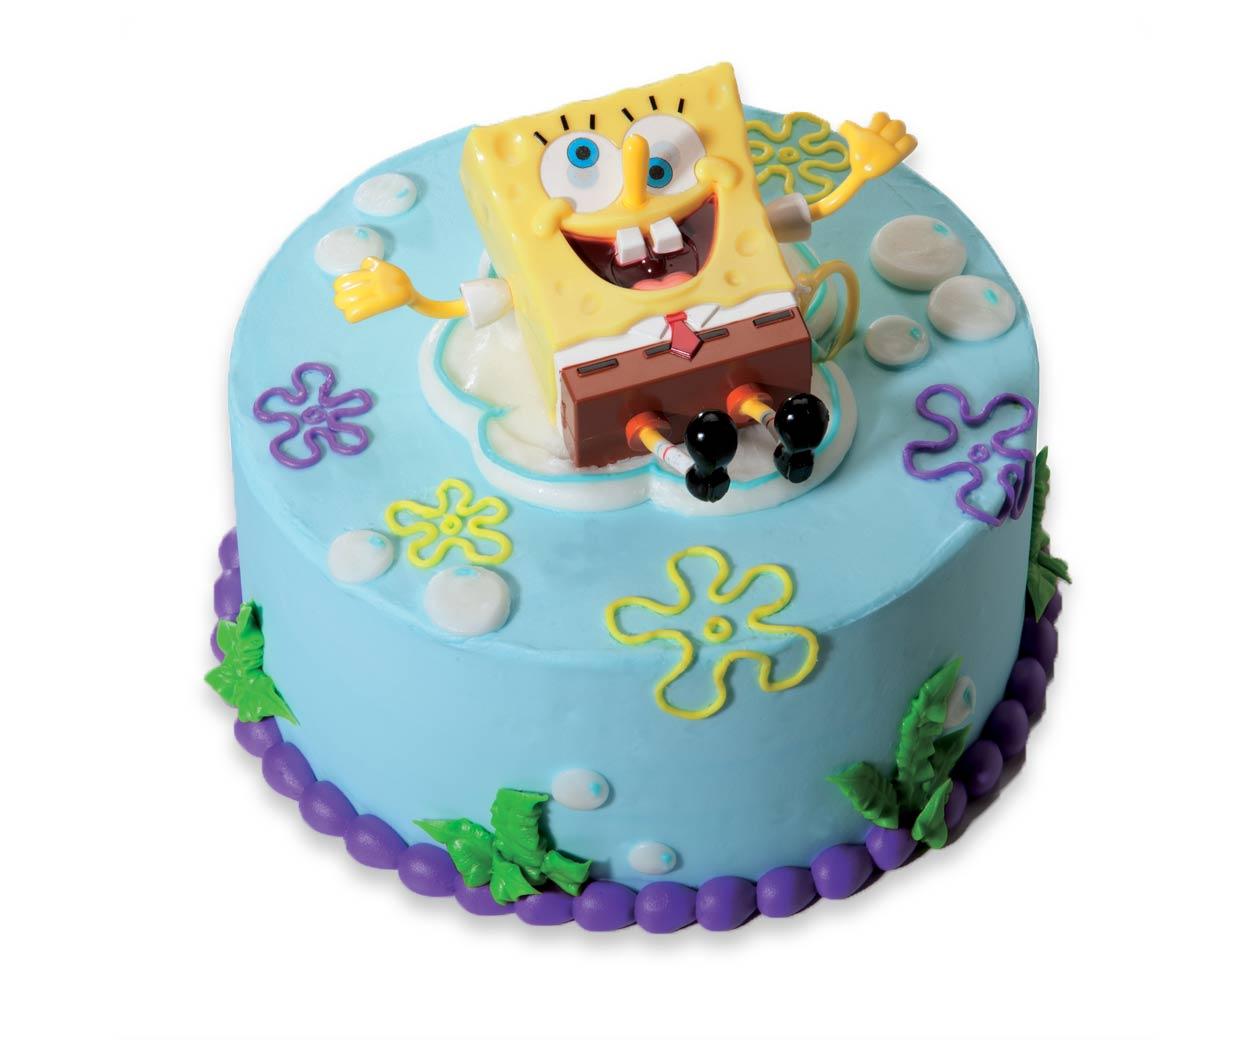 Dq Birthday Cake Prices